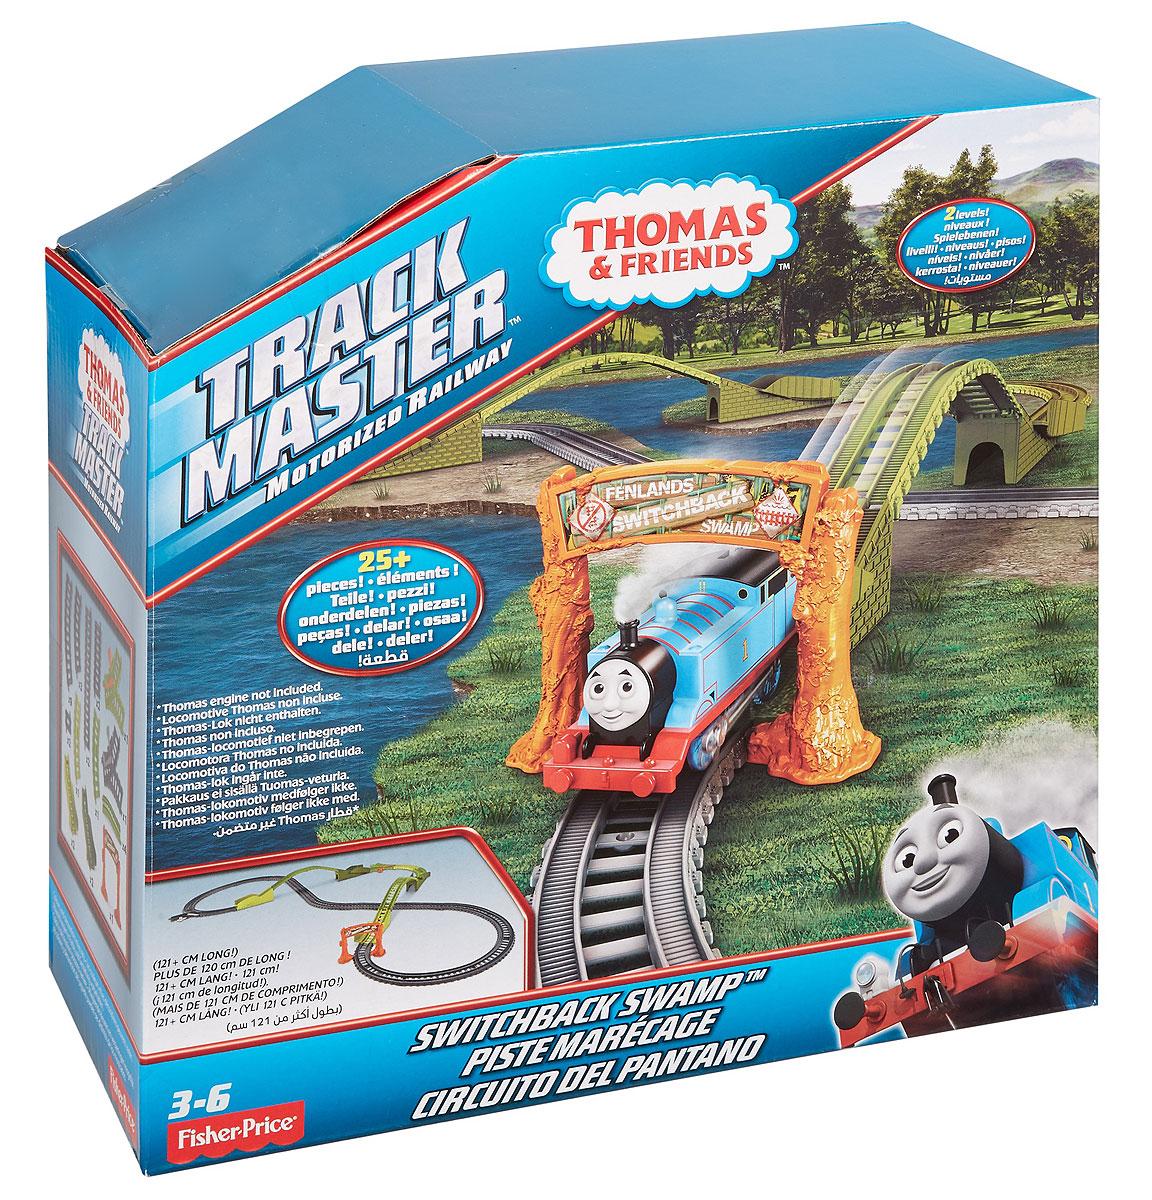 Thomas & Friends Железная дорога Switchback Swamp - Железные дороги